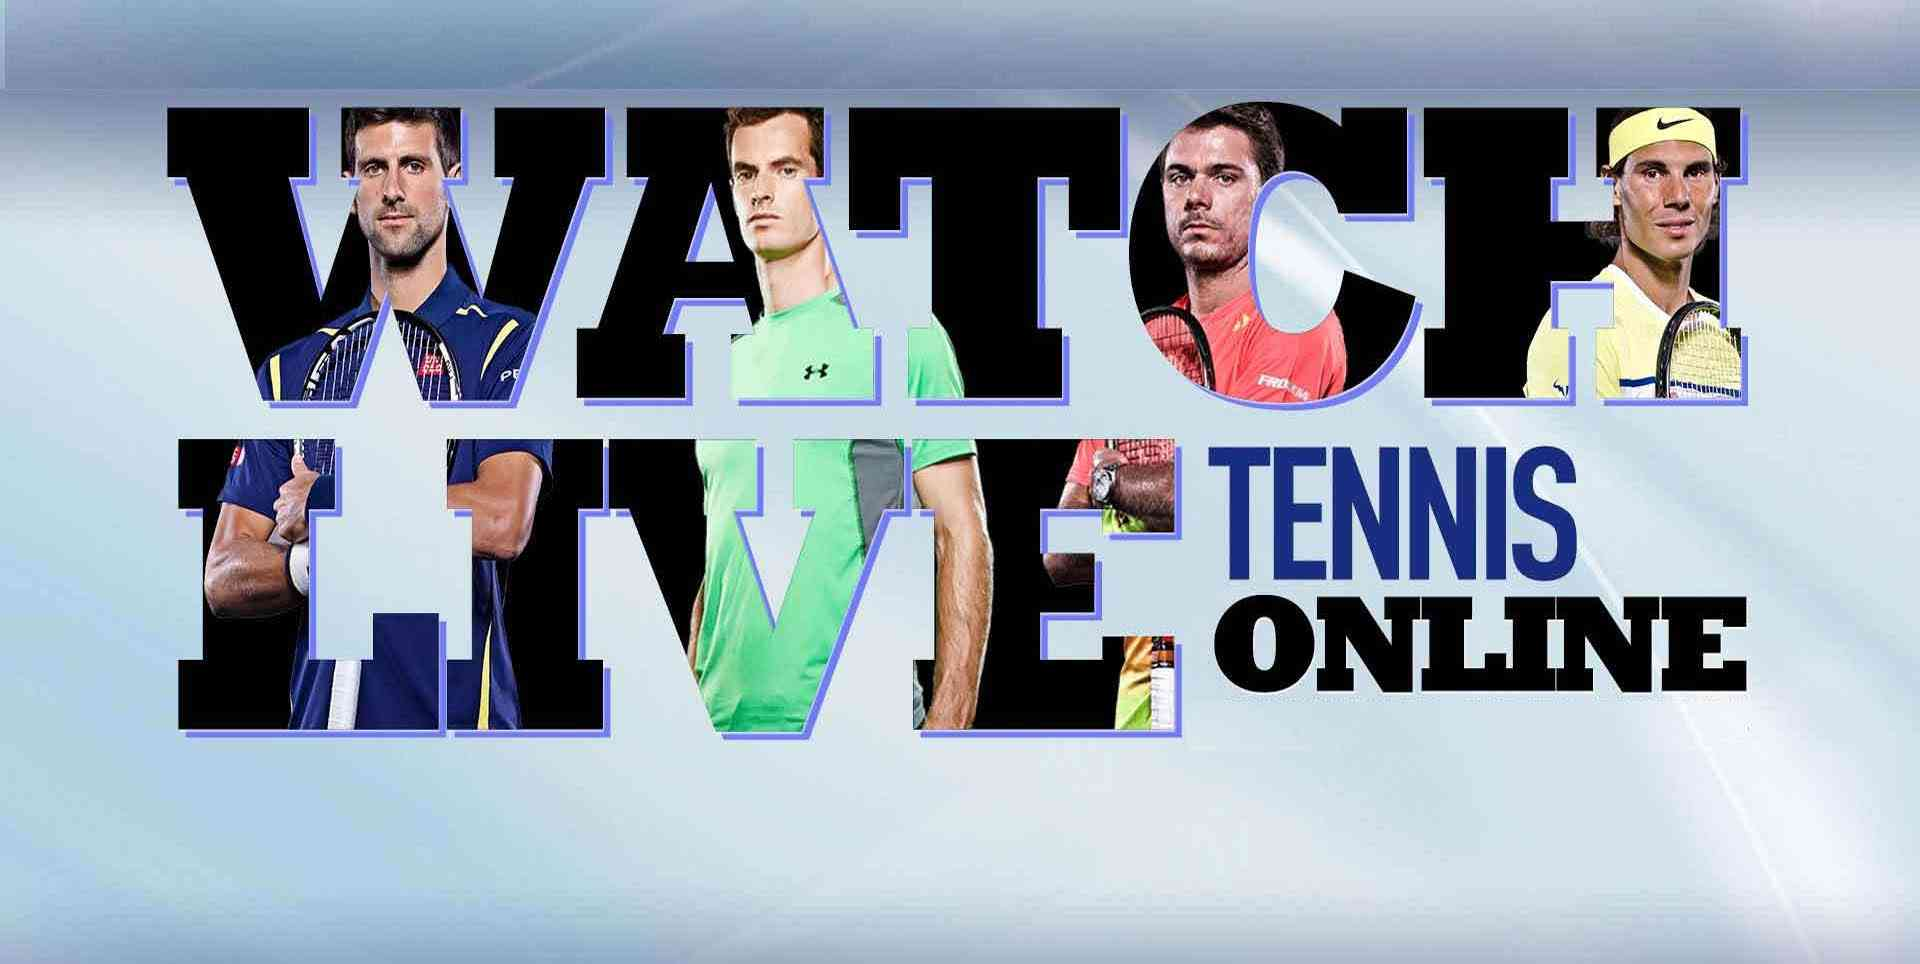 watch-3rd-round-a.-ivanovic-vs-s.-lisicki-online